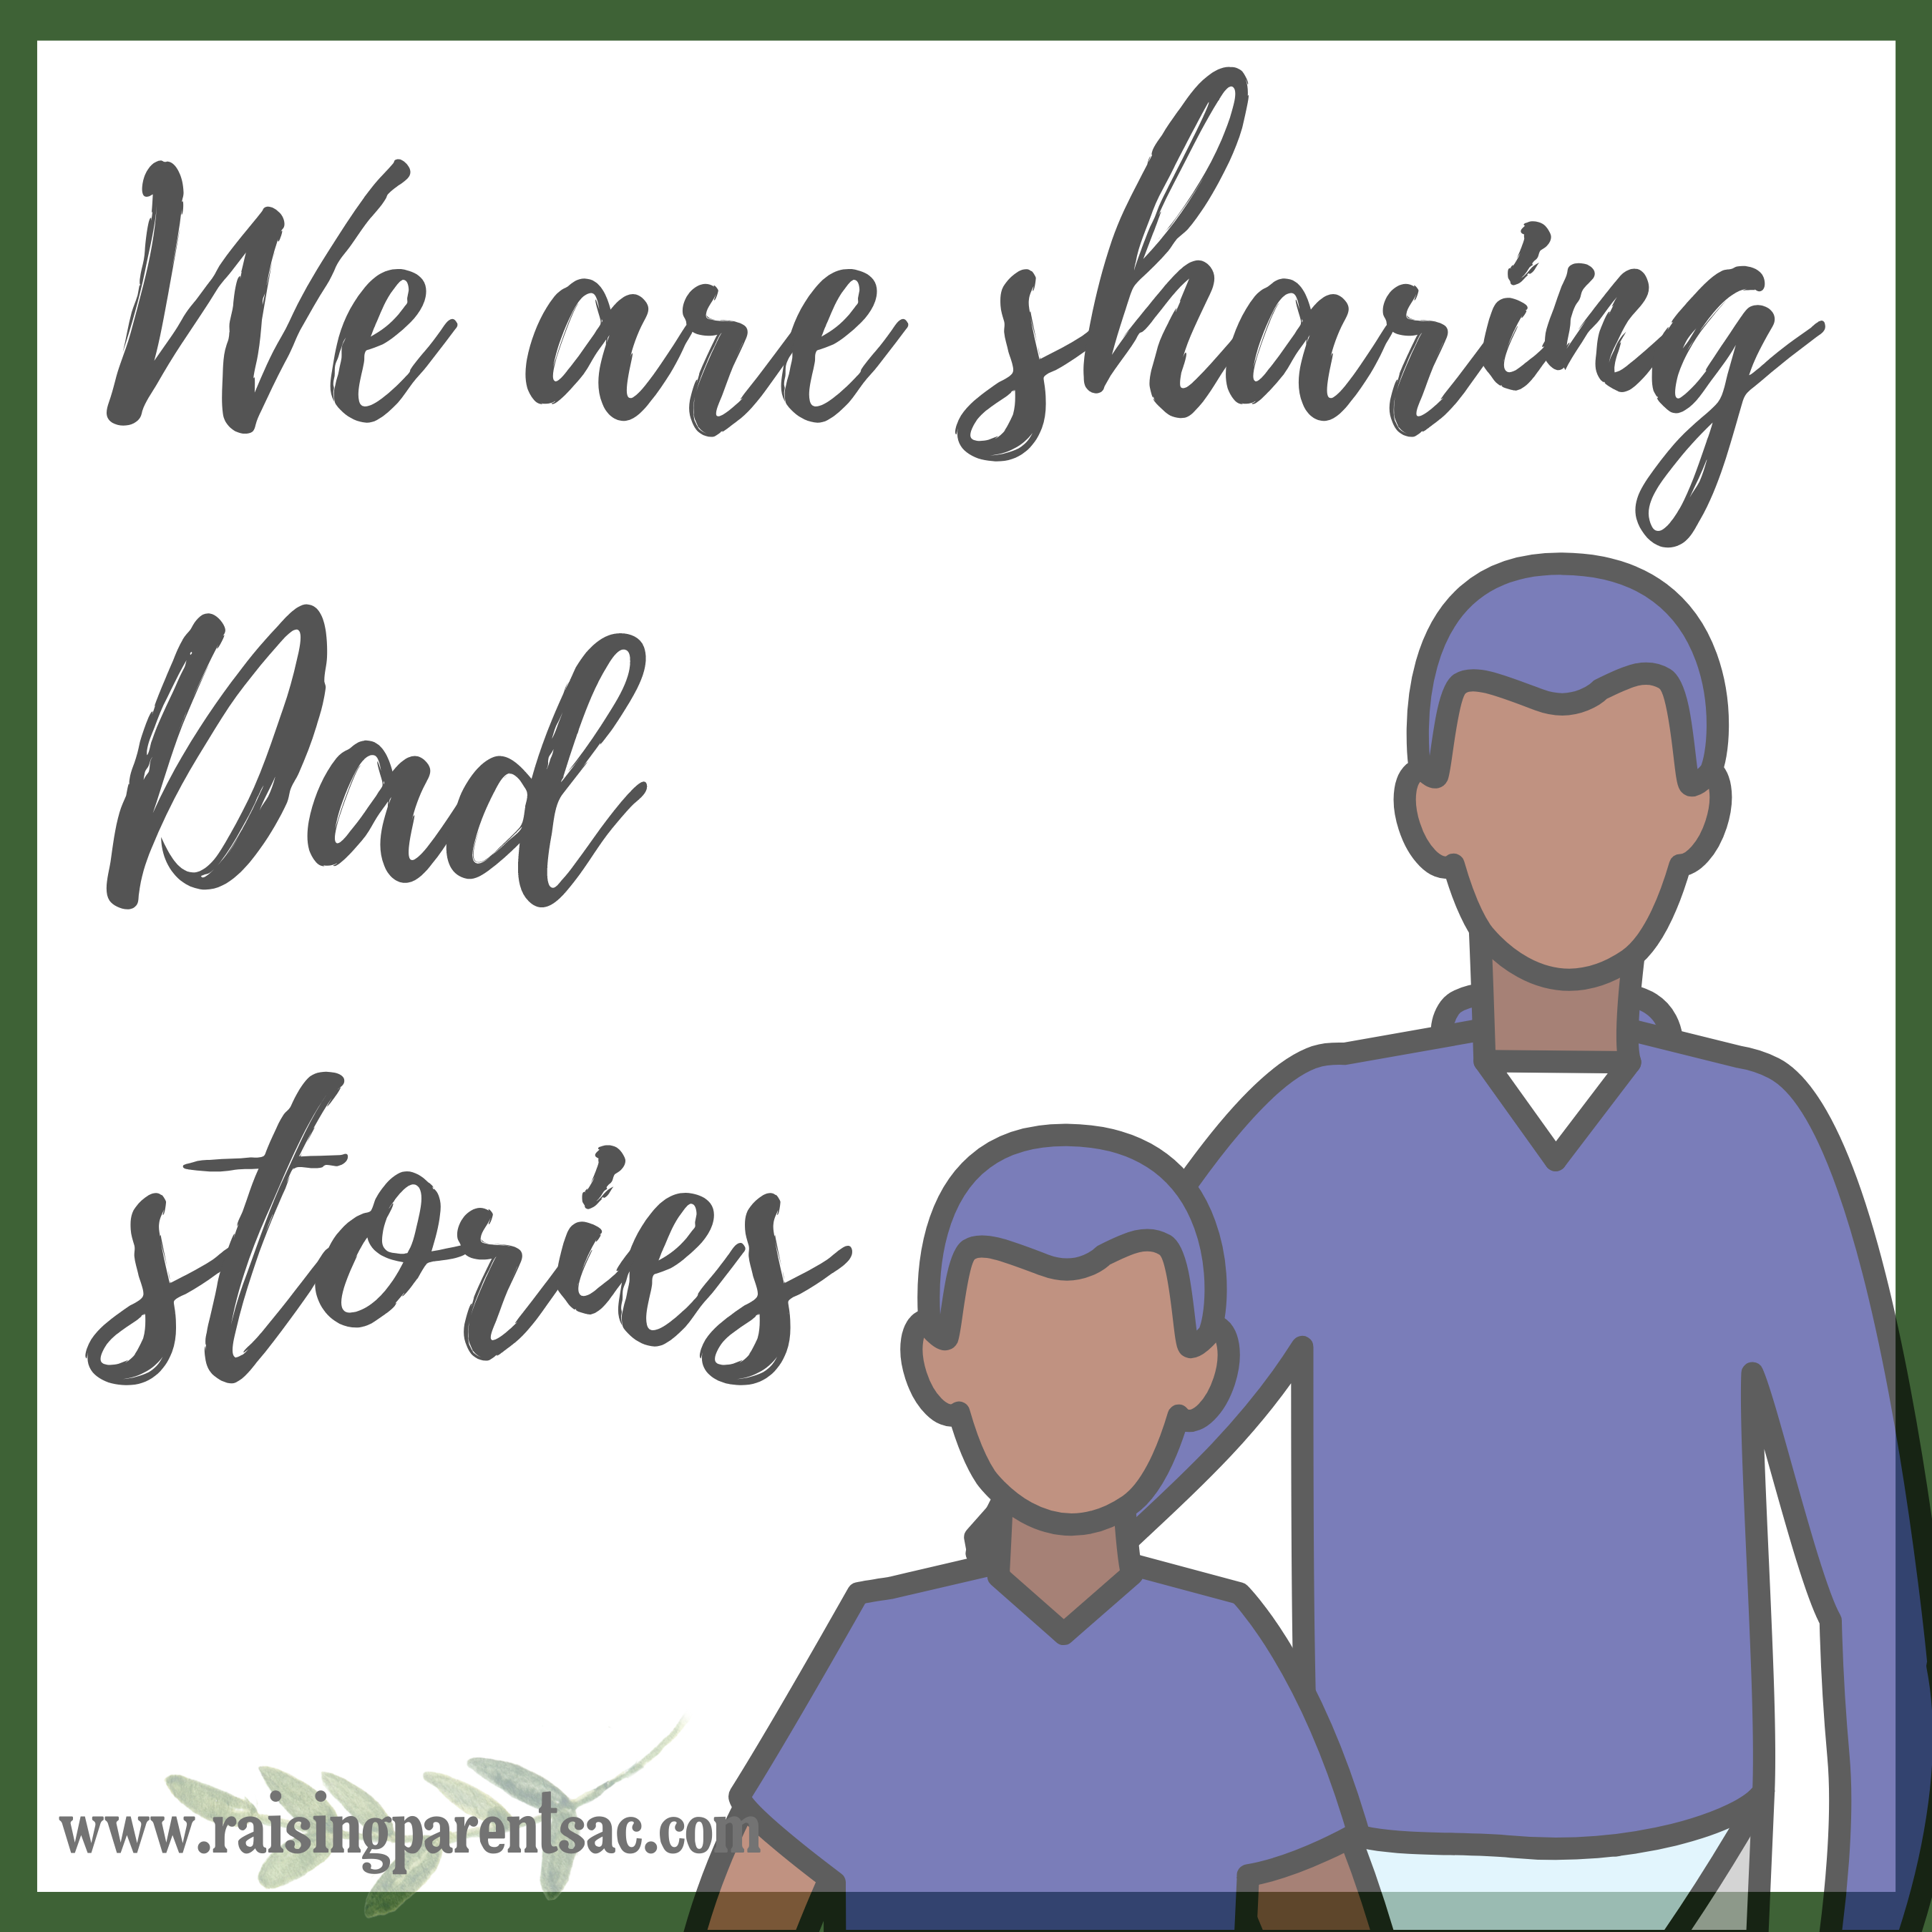 We told dad stories